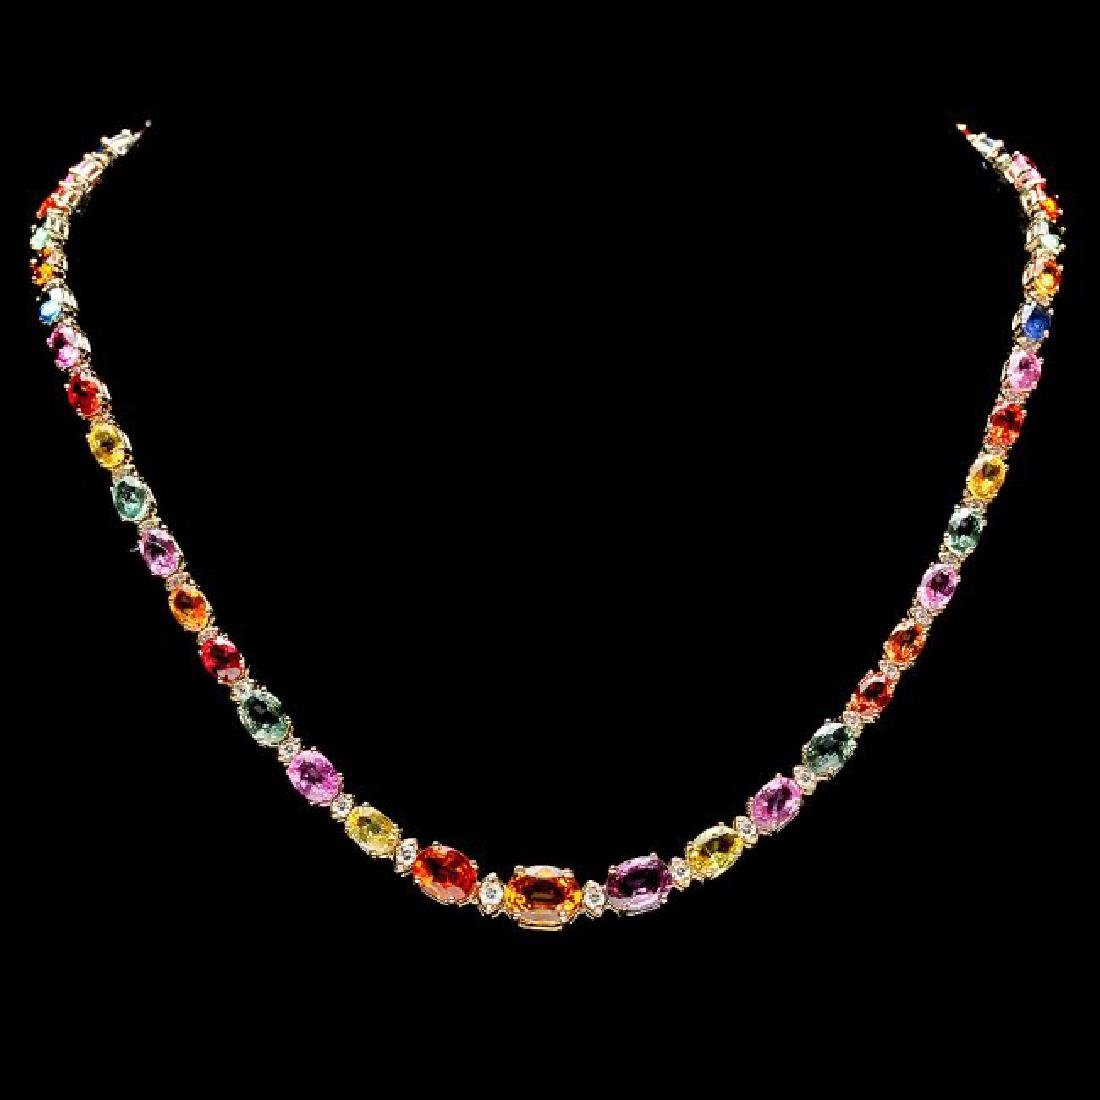 14k Gold 33ct Sapphire 1.2ct Diamond Necklace